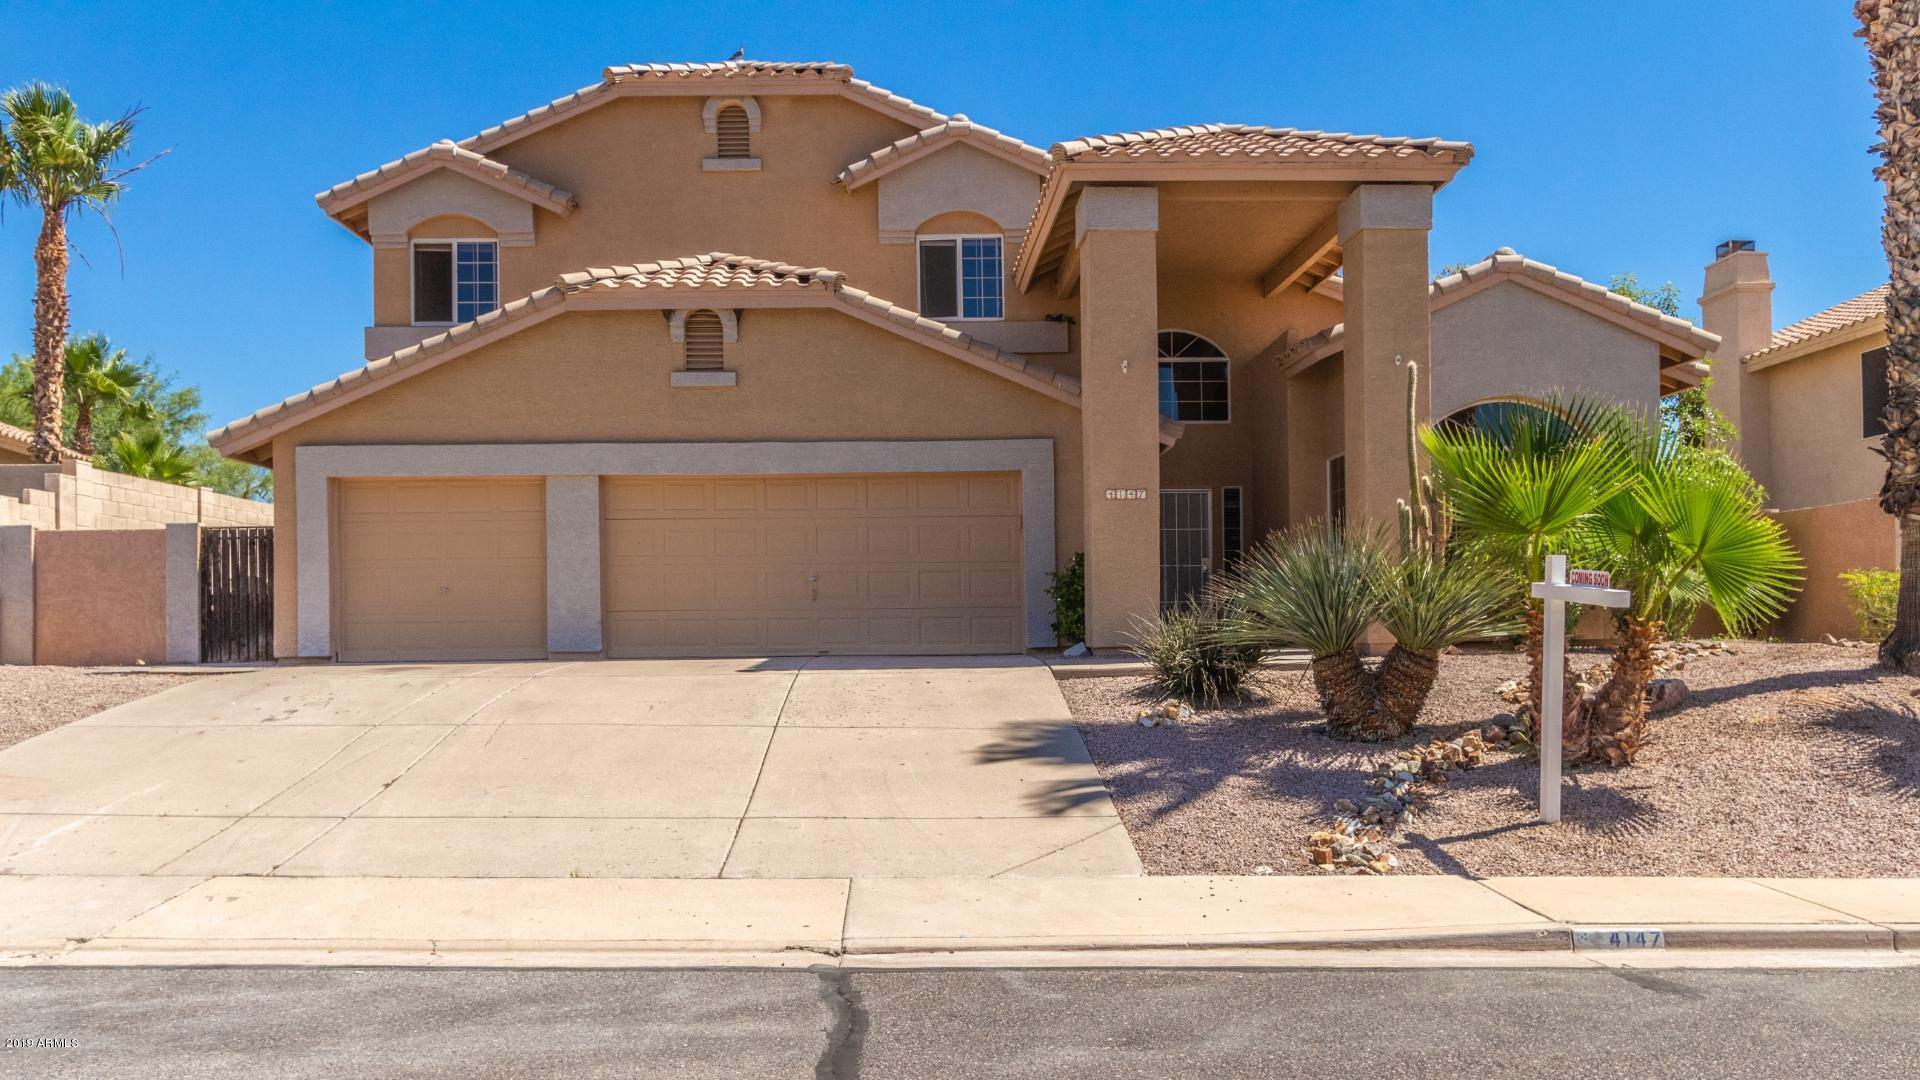 Photo of 4147 N LOMOND Street, Mesa, AZ 85215